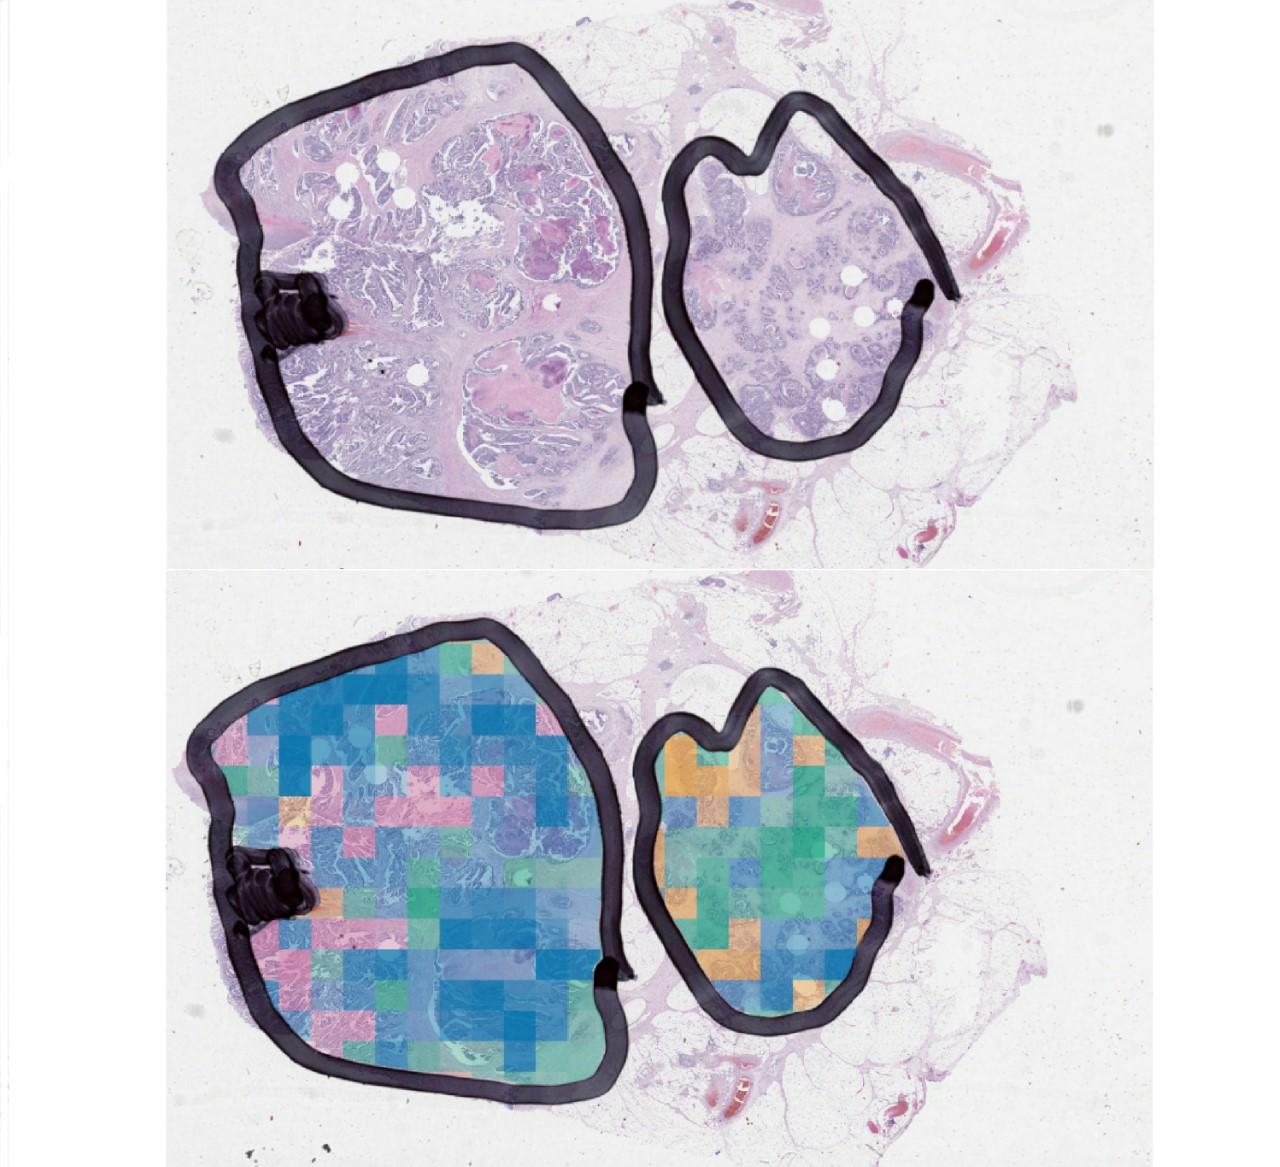 Tumour images under microscope